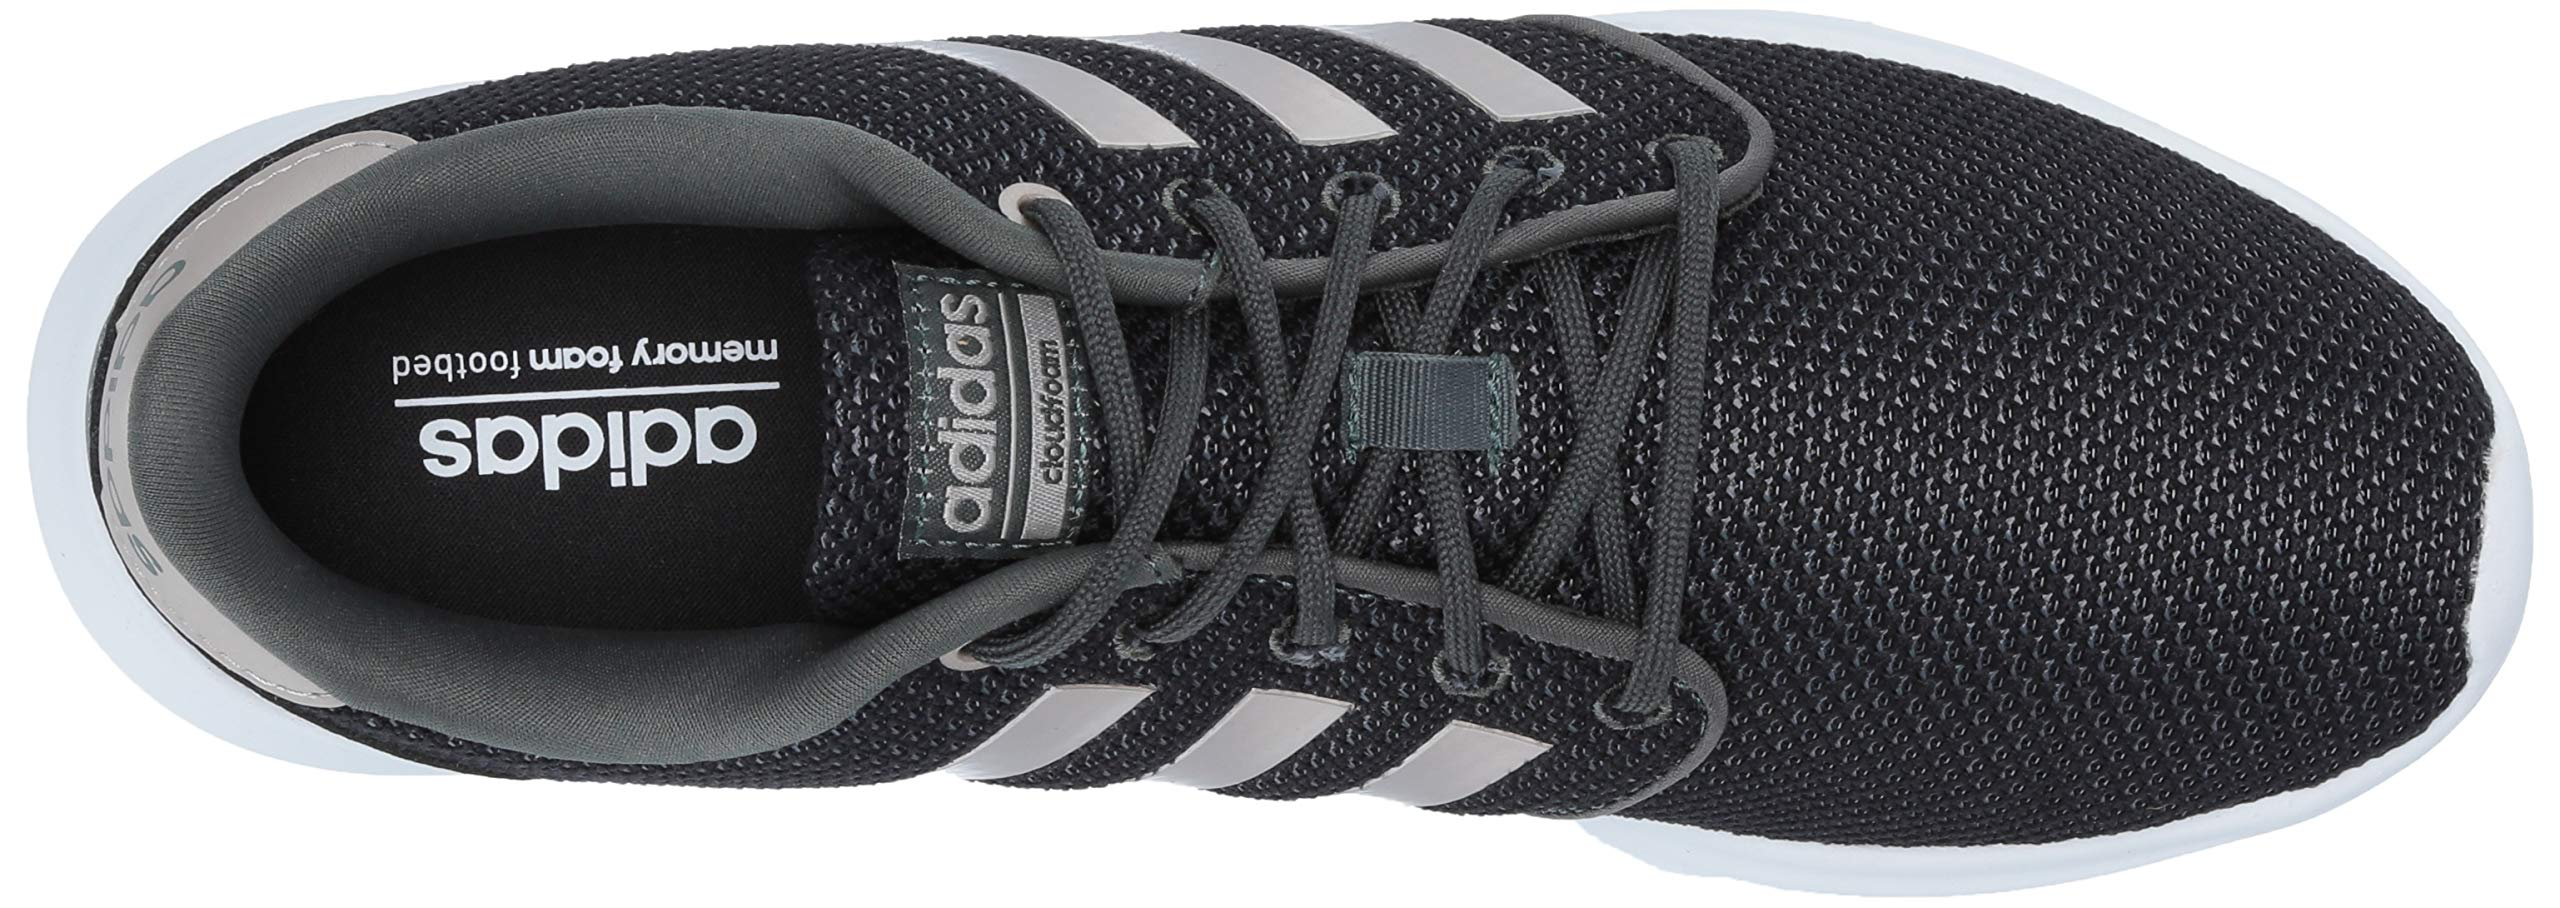 adidas Women's Cloudfoam QT Racer, Legend Ivy/Platino Metallic/Black, 5.5 M US by adidas (Image #7)